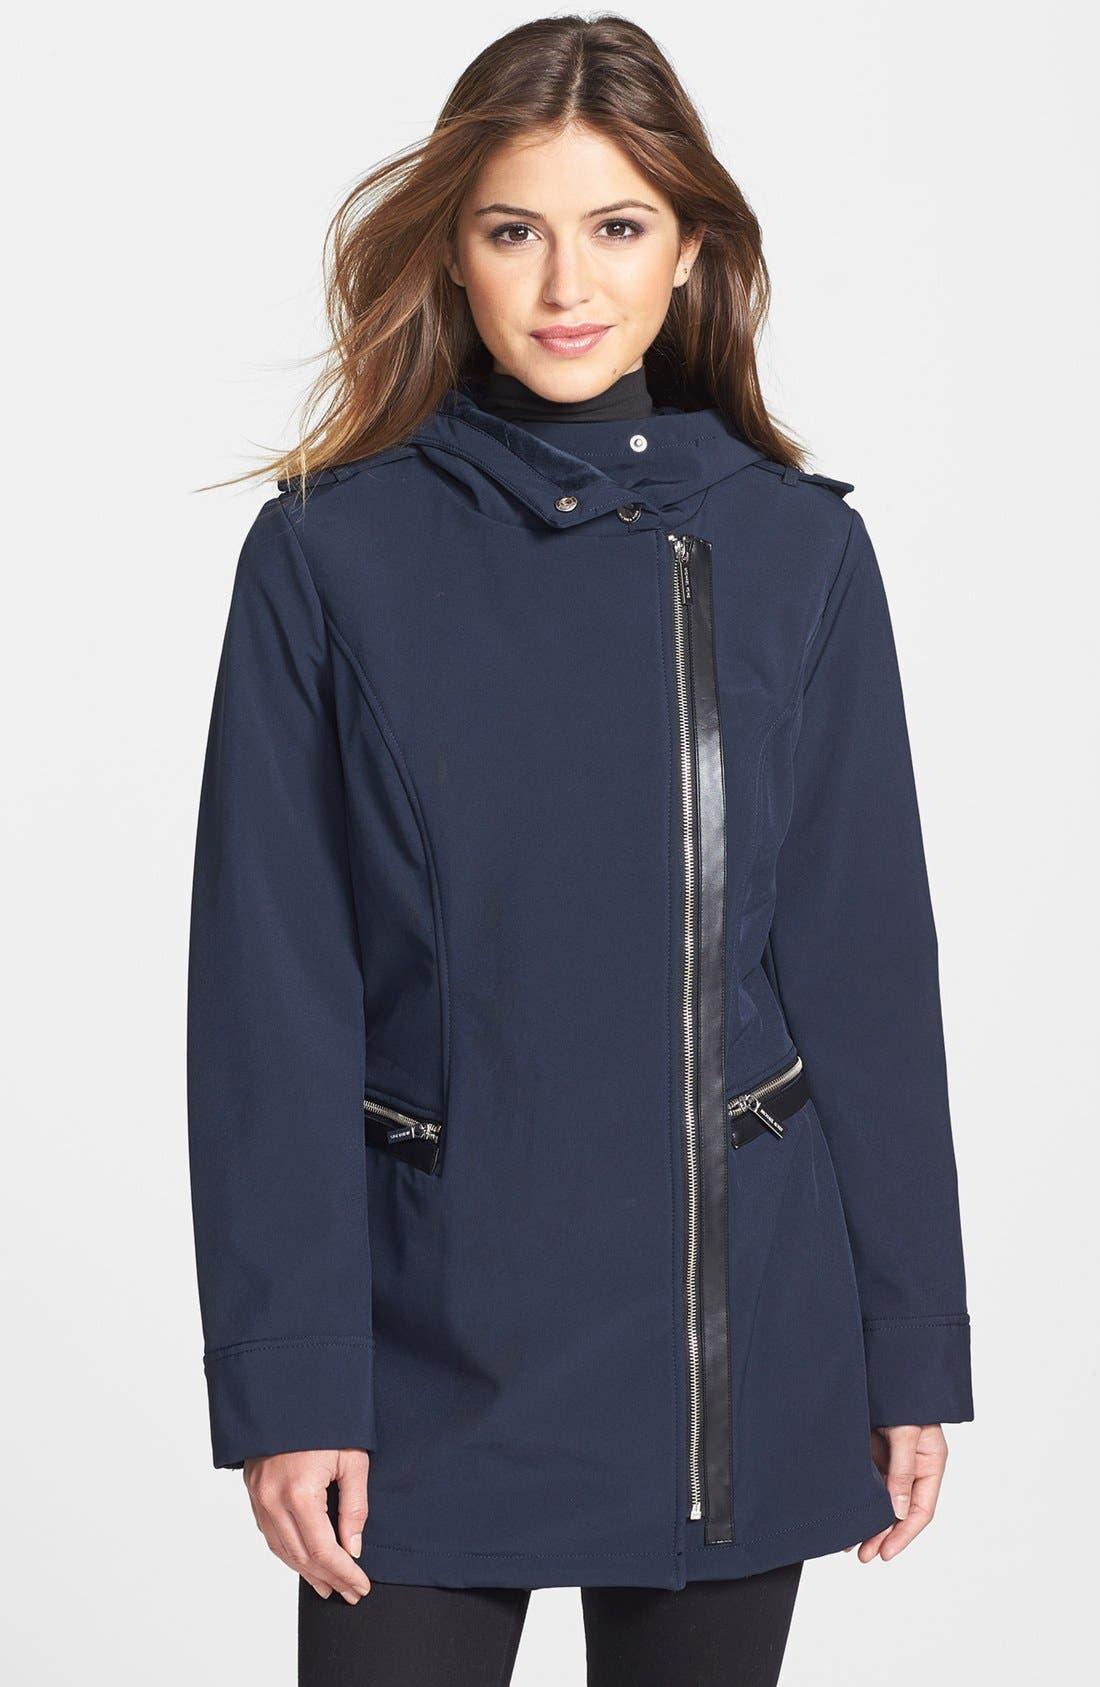 Alternate Image 1 Selected - MICHAEL Michael Kors Faux Leather Trim Soft Shell Jacket (Regular & Petite)